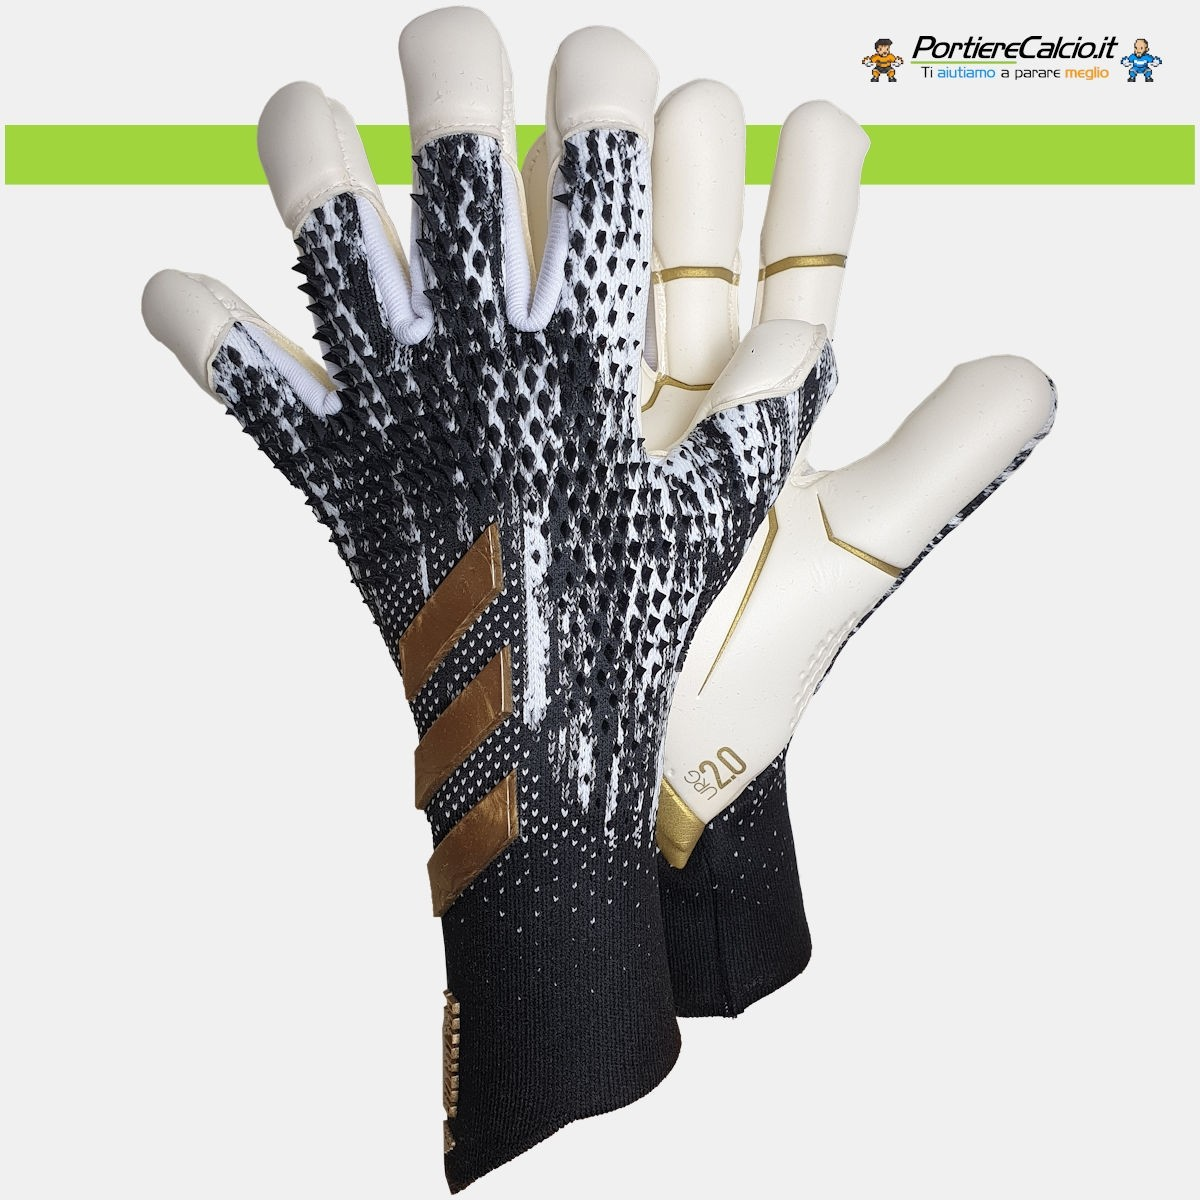 Donnarumma usa i guanti Adidas Predator 20 Pro Inflight